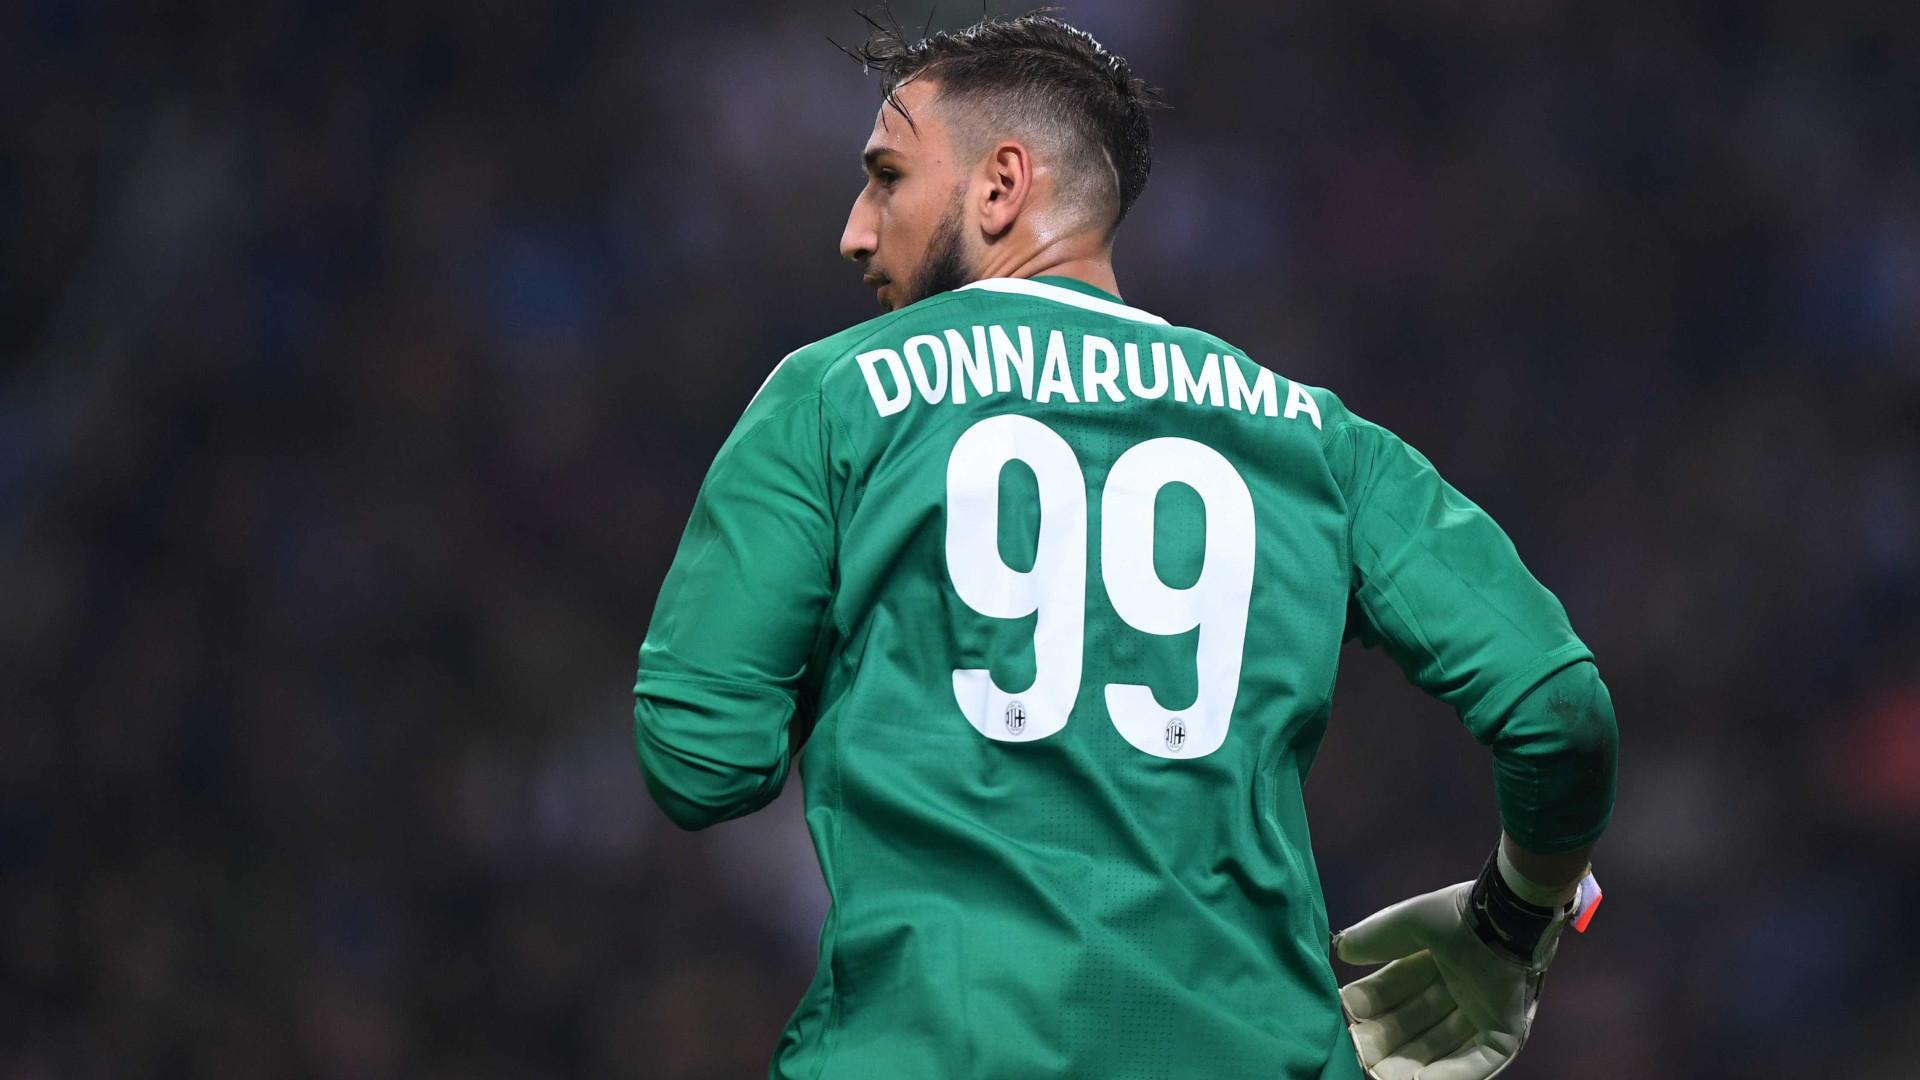 AC Milan propõe troca direta entre Donnarumma e Morata